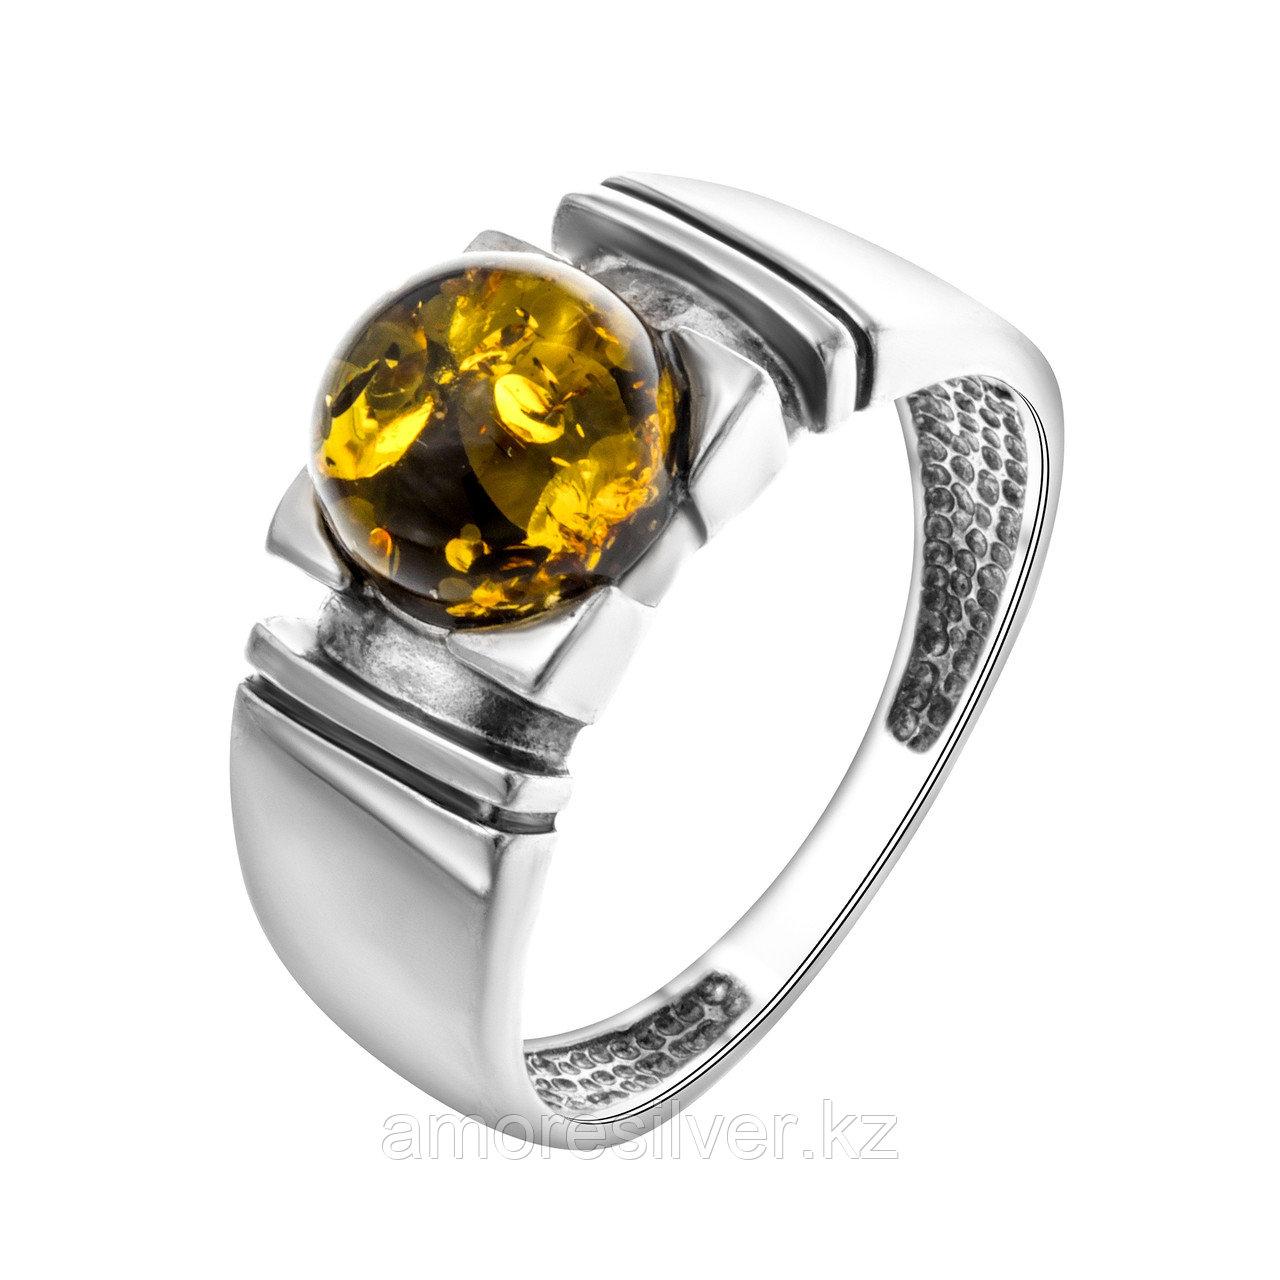 Кольцо Darvin серебро с родием, янтарь, круг 920011028